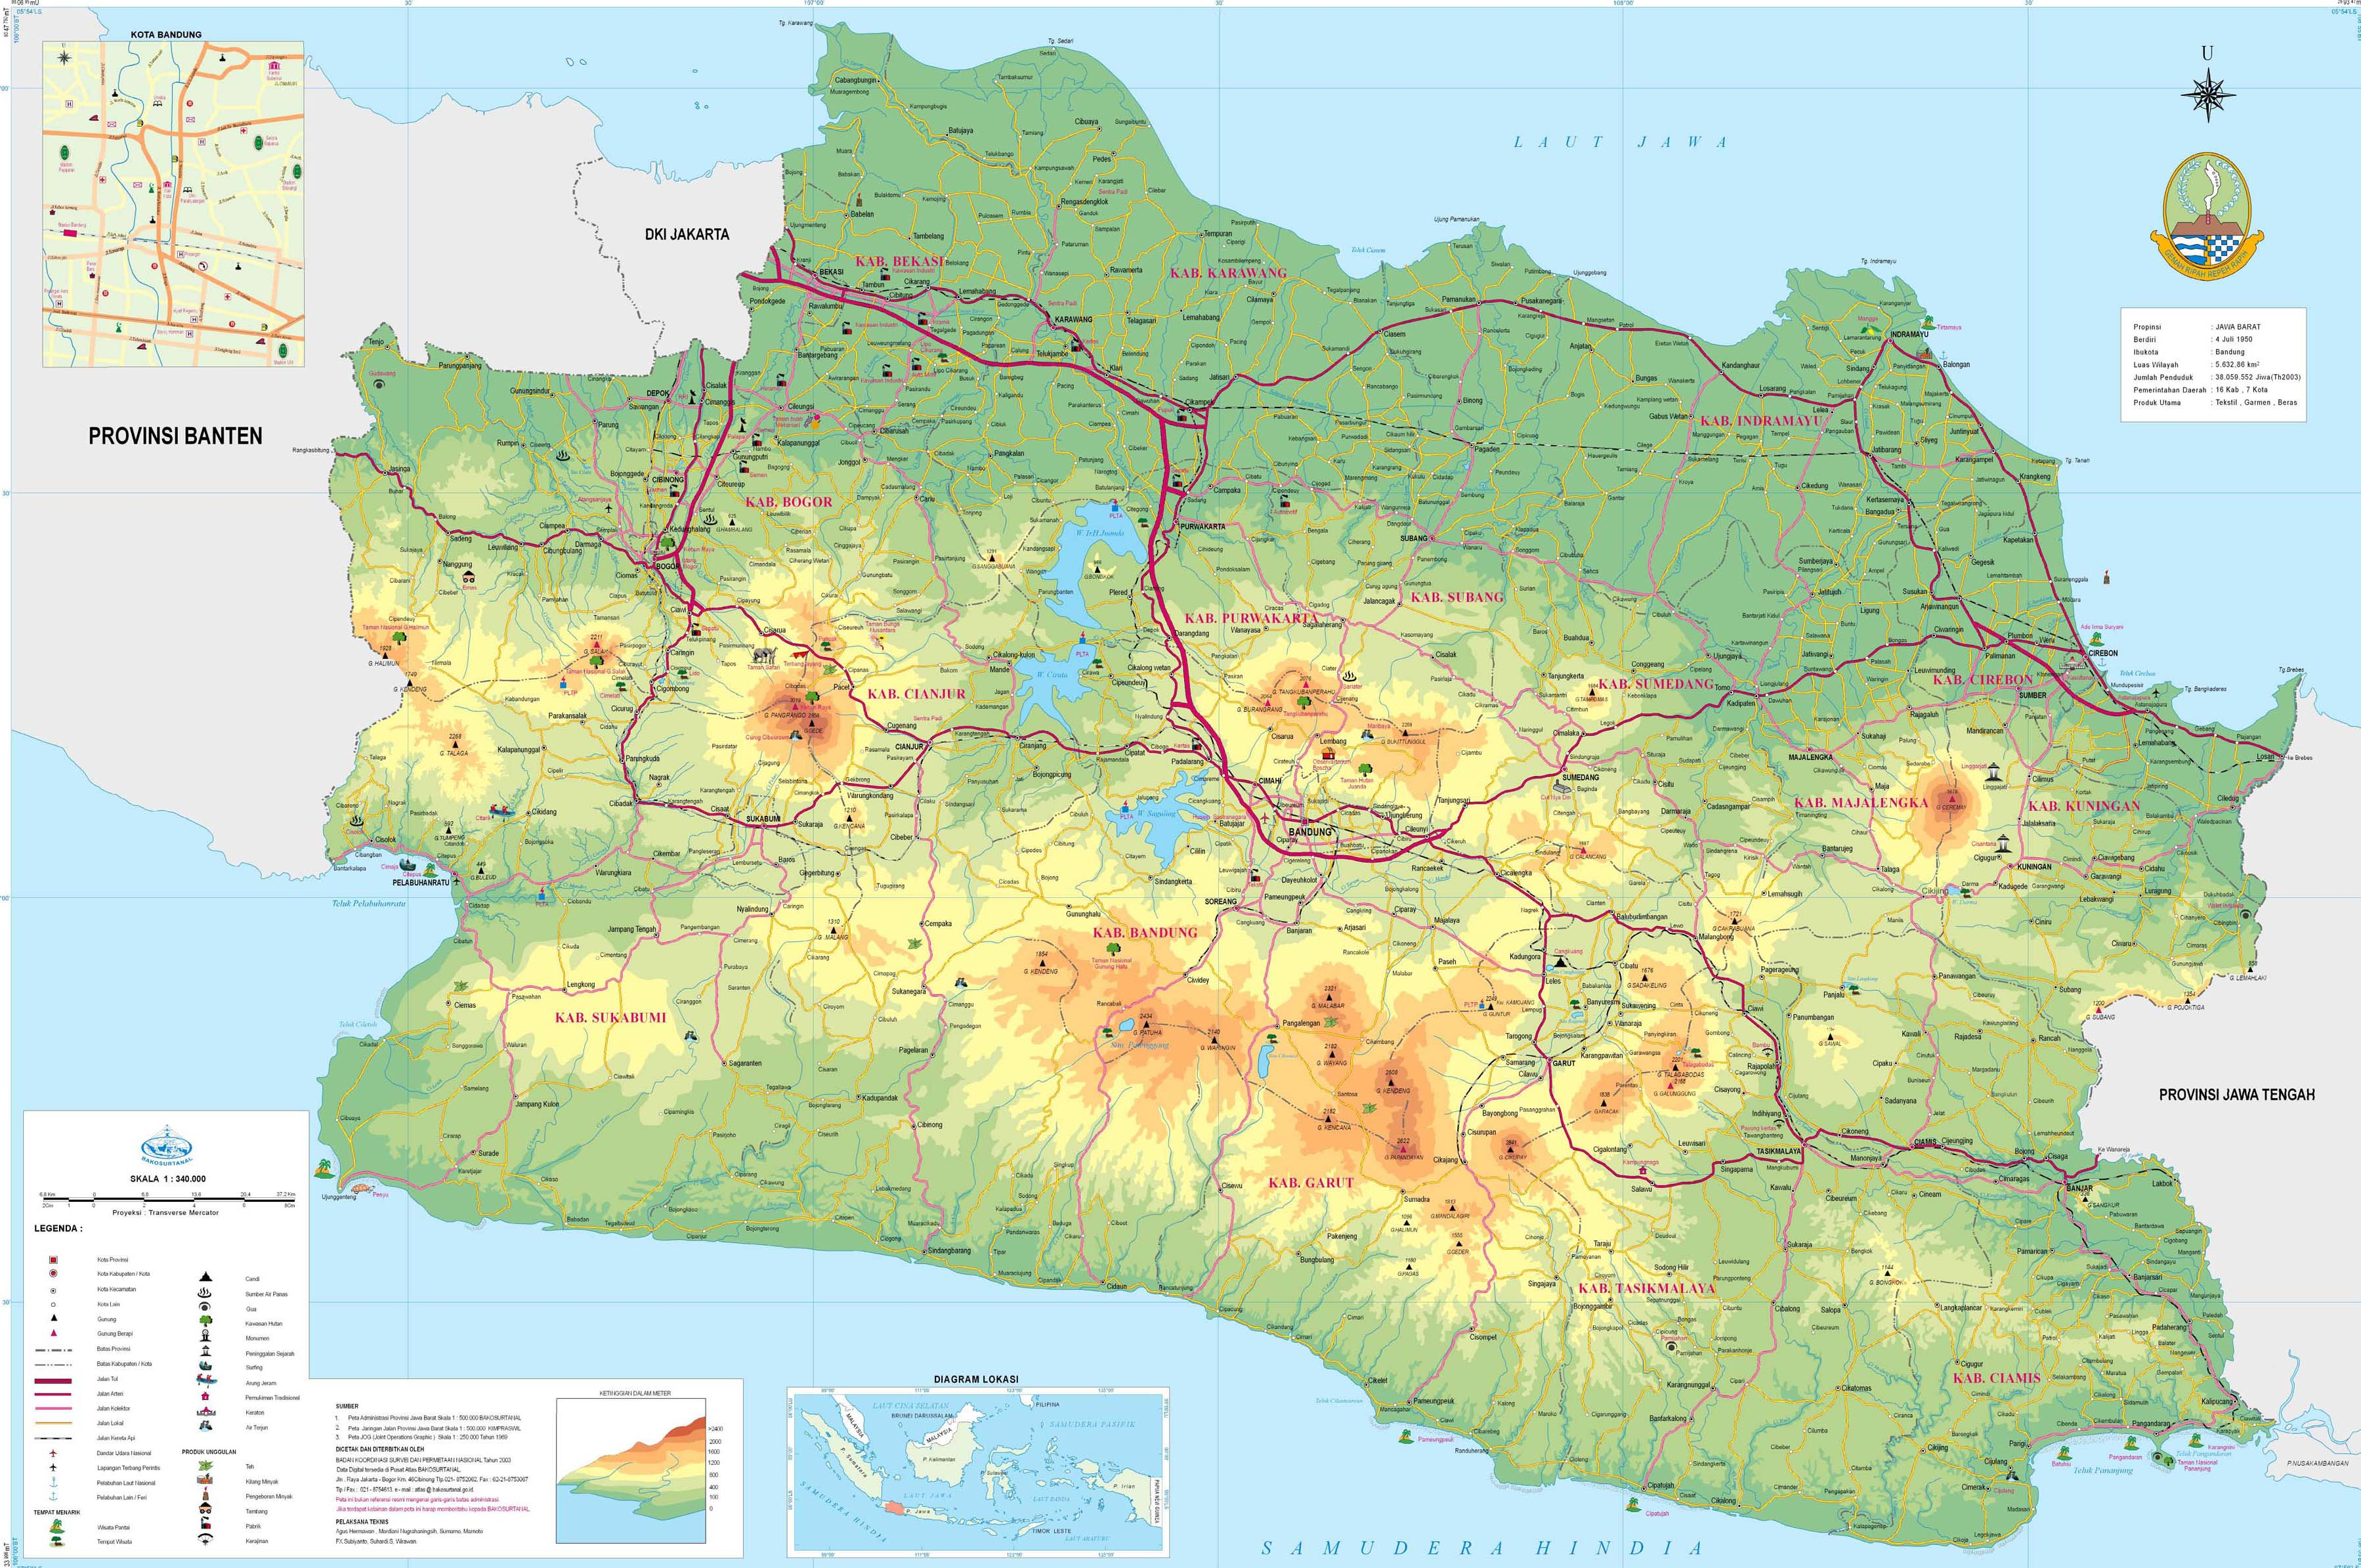 peta kota peta provinsi jawa barat